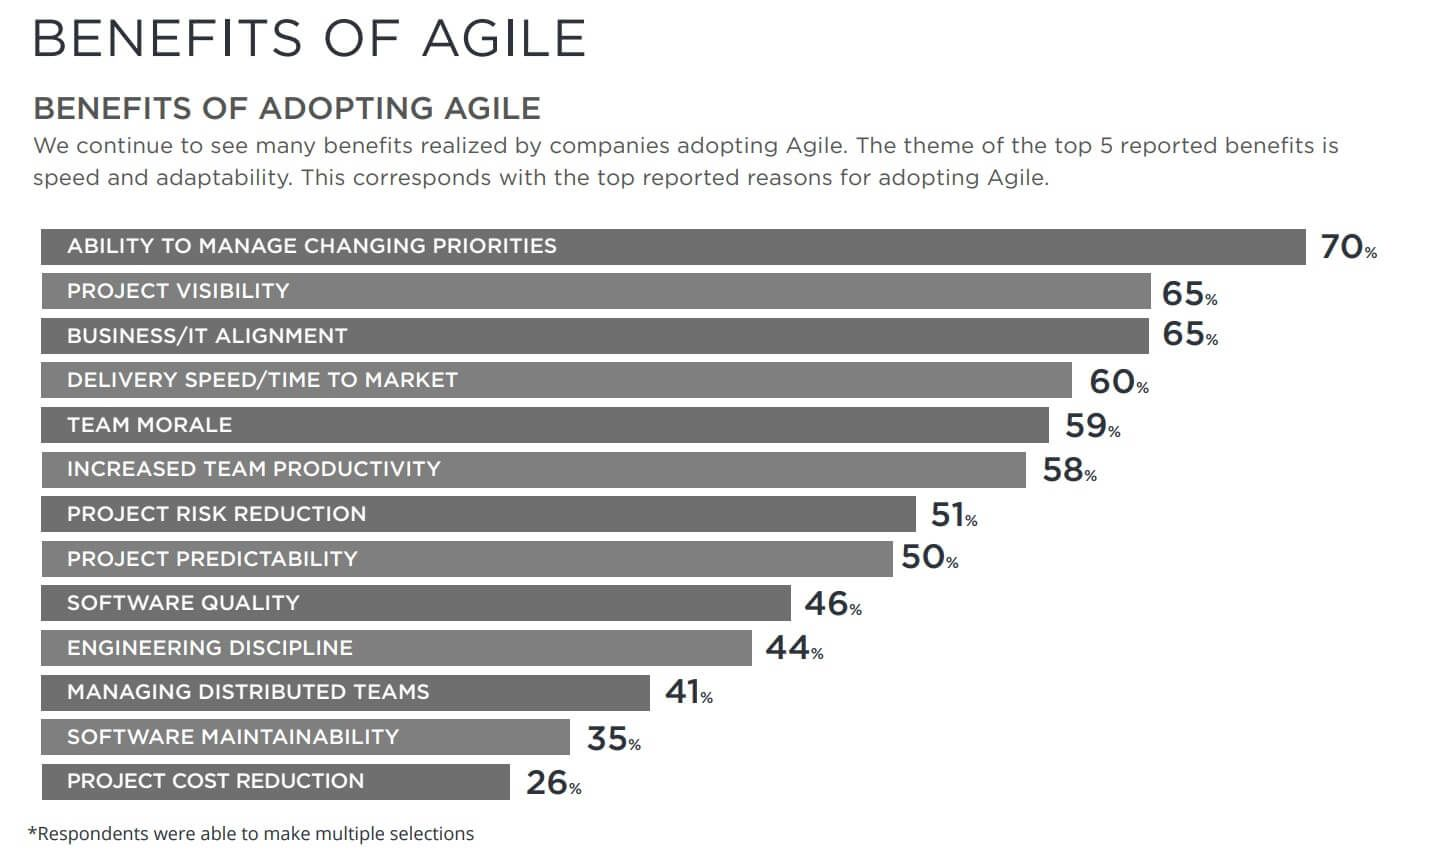 benefits of agile bar graph